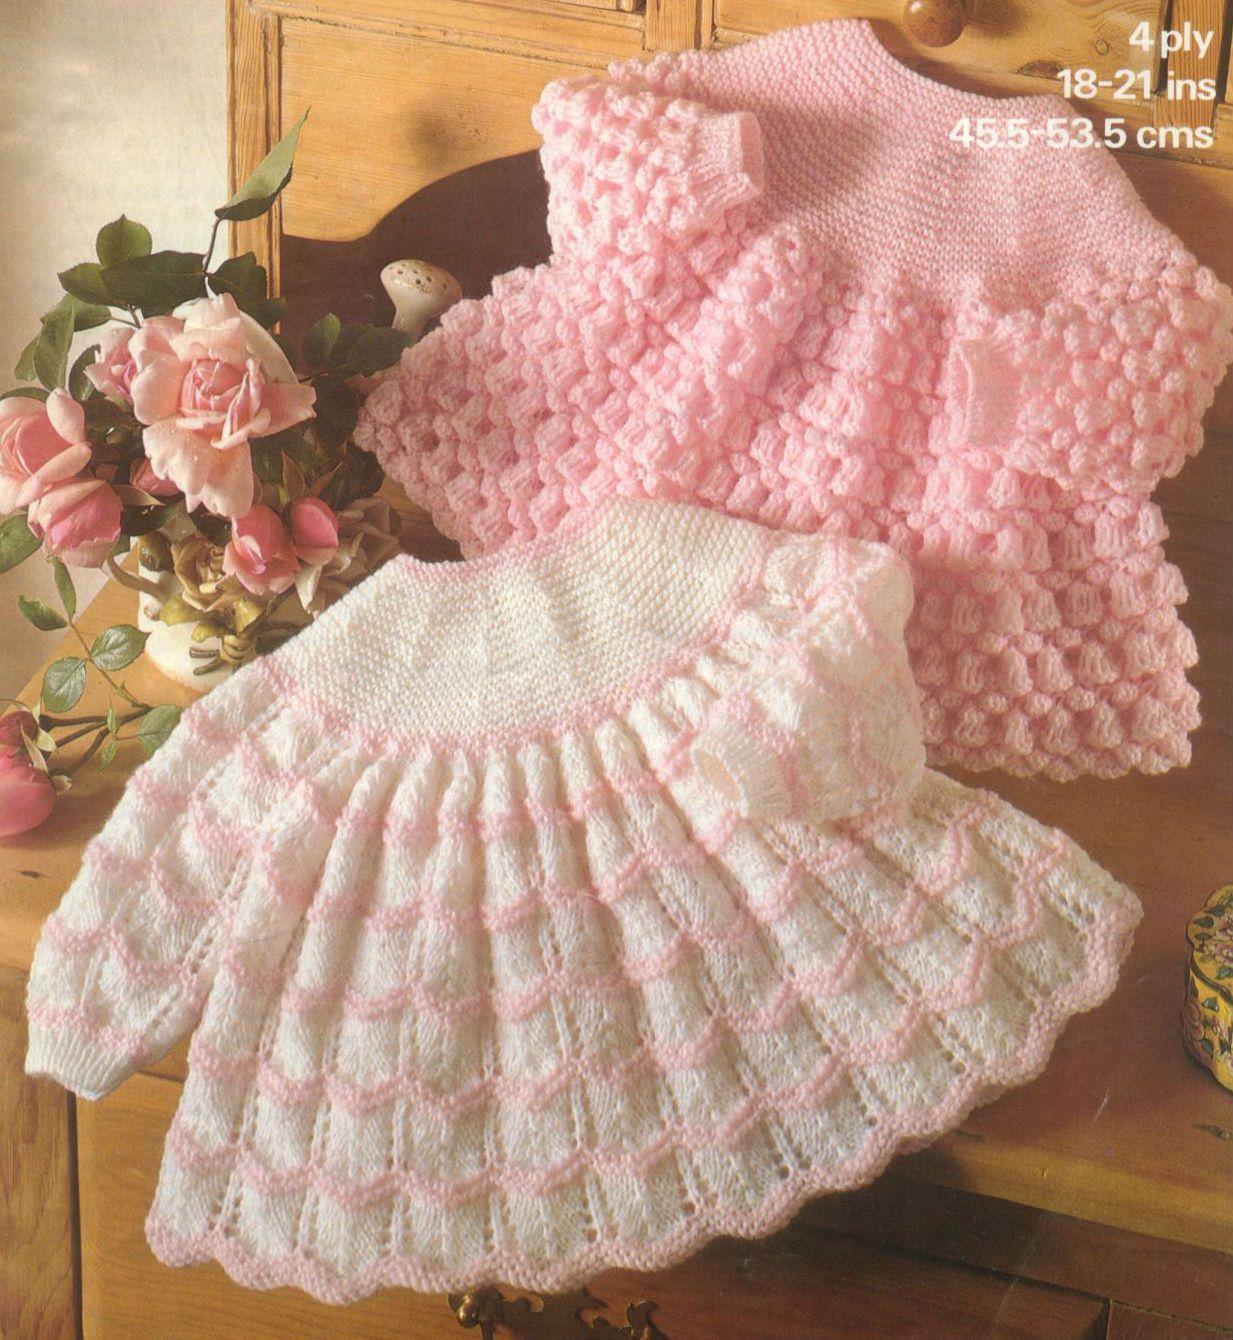 Knit Baby Dress Vintage Knitting Pattern 18 21 Inch Chest